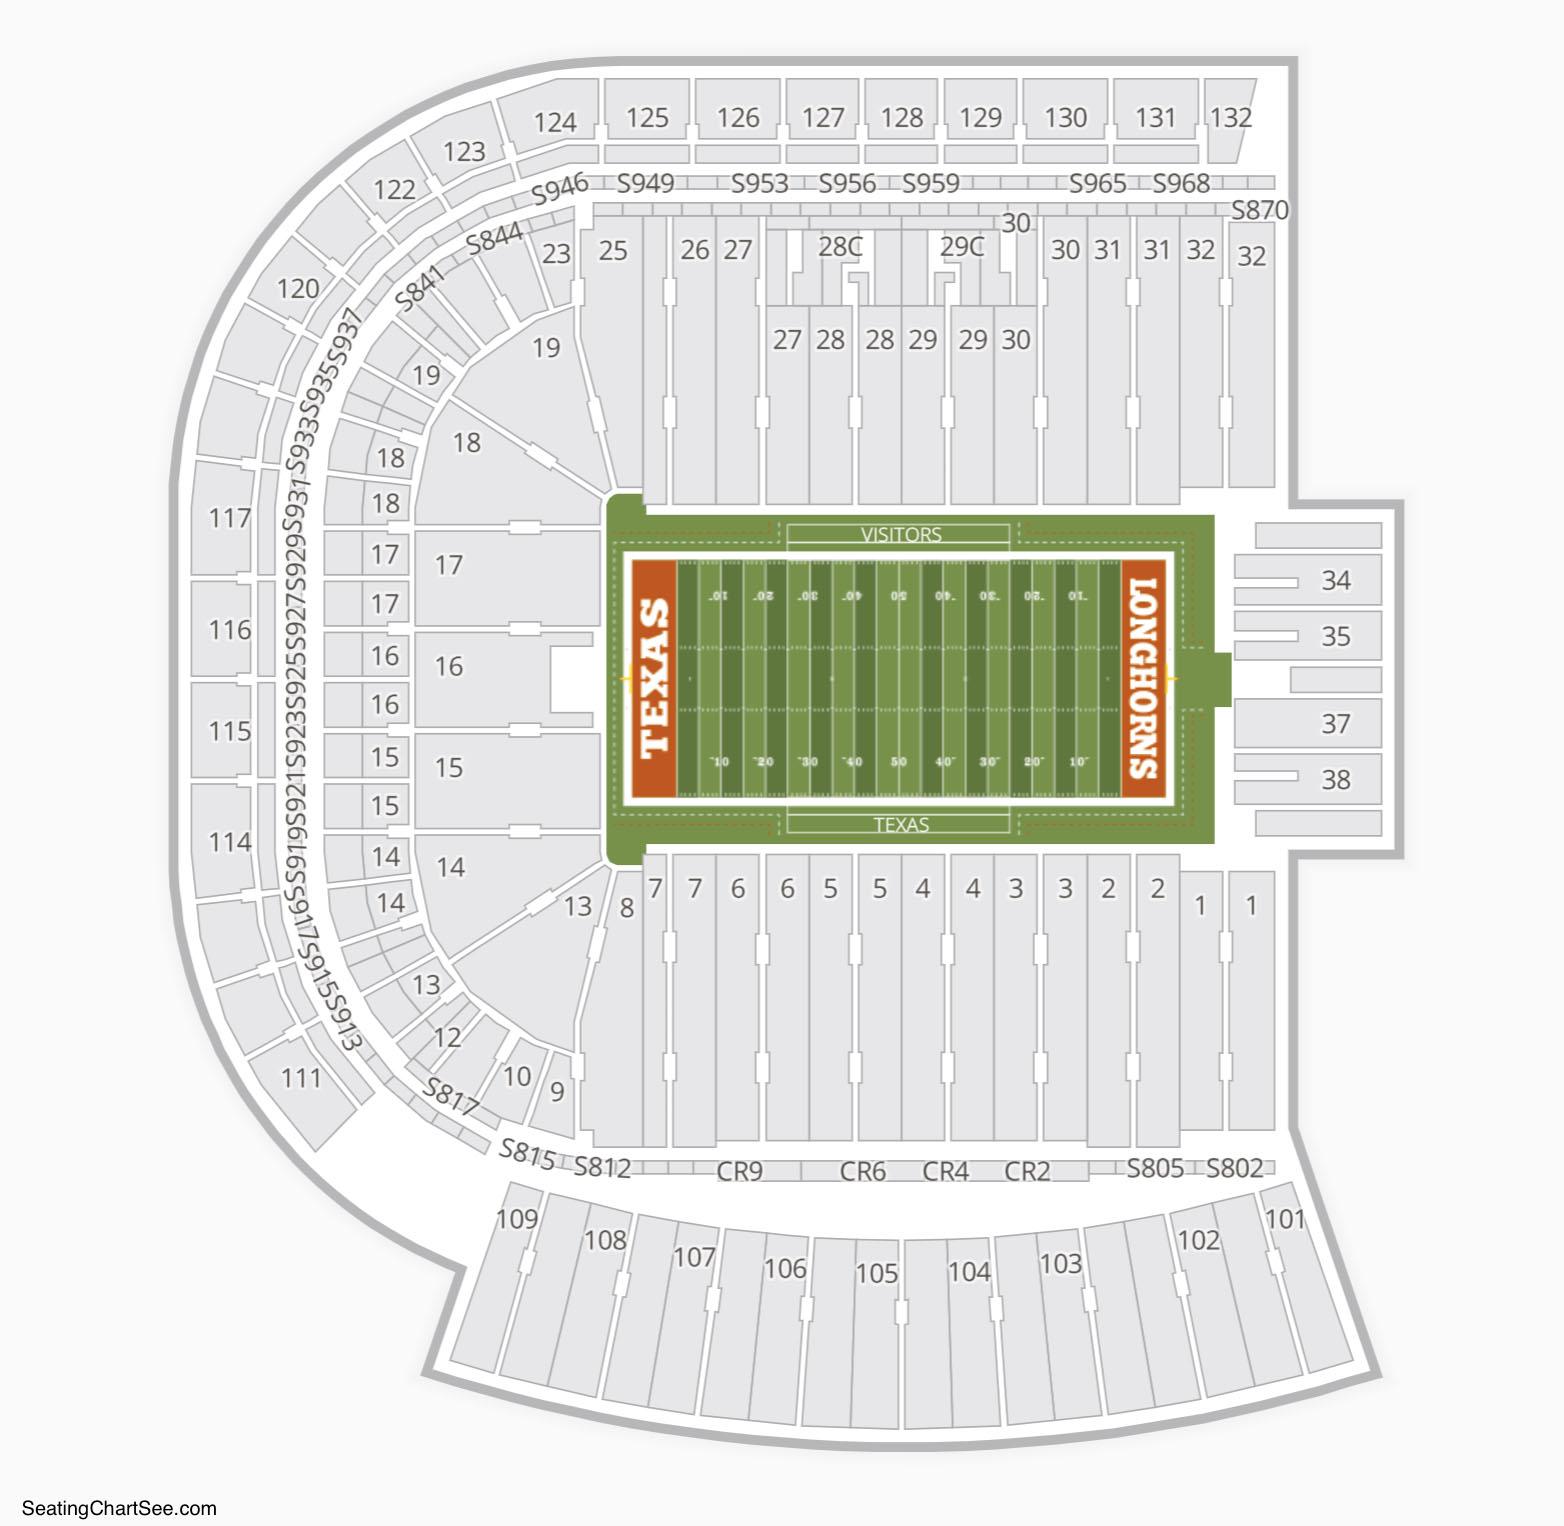 Darrell K Royal Texas Memorial Stadium Seating Chart